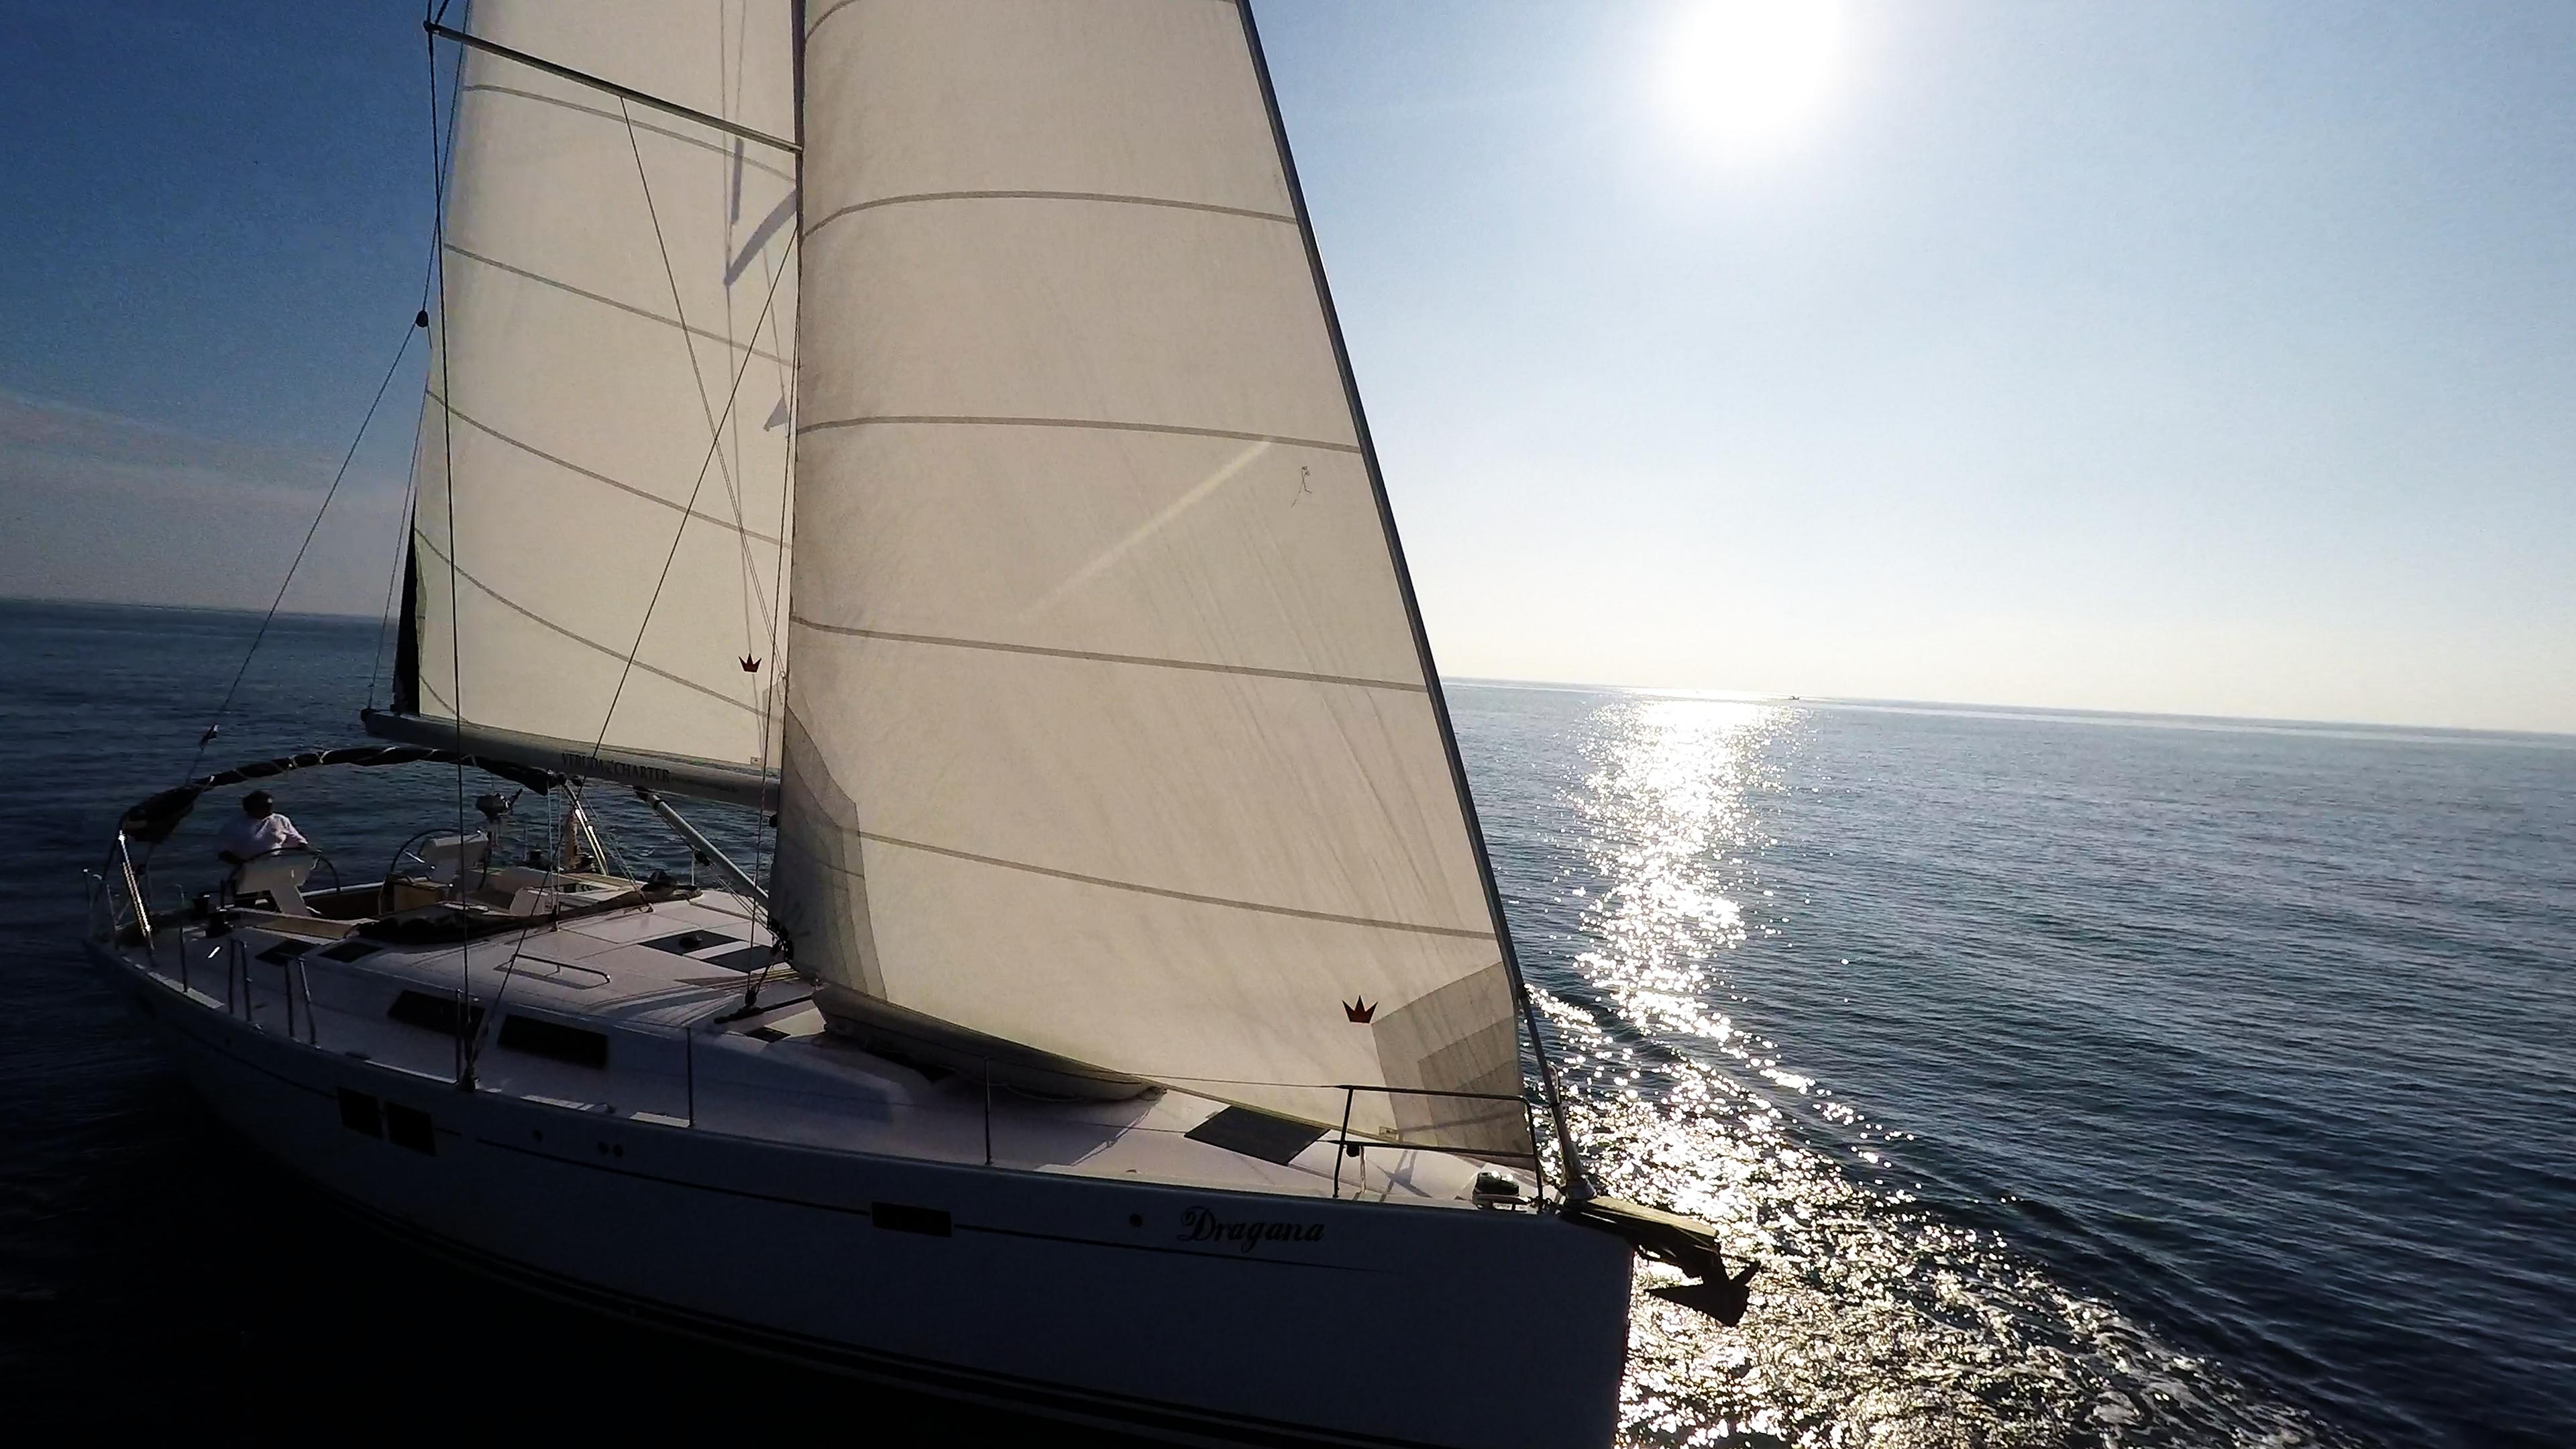 sailing yacht sun sails sailboat sea sailing yacht Hanse 505